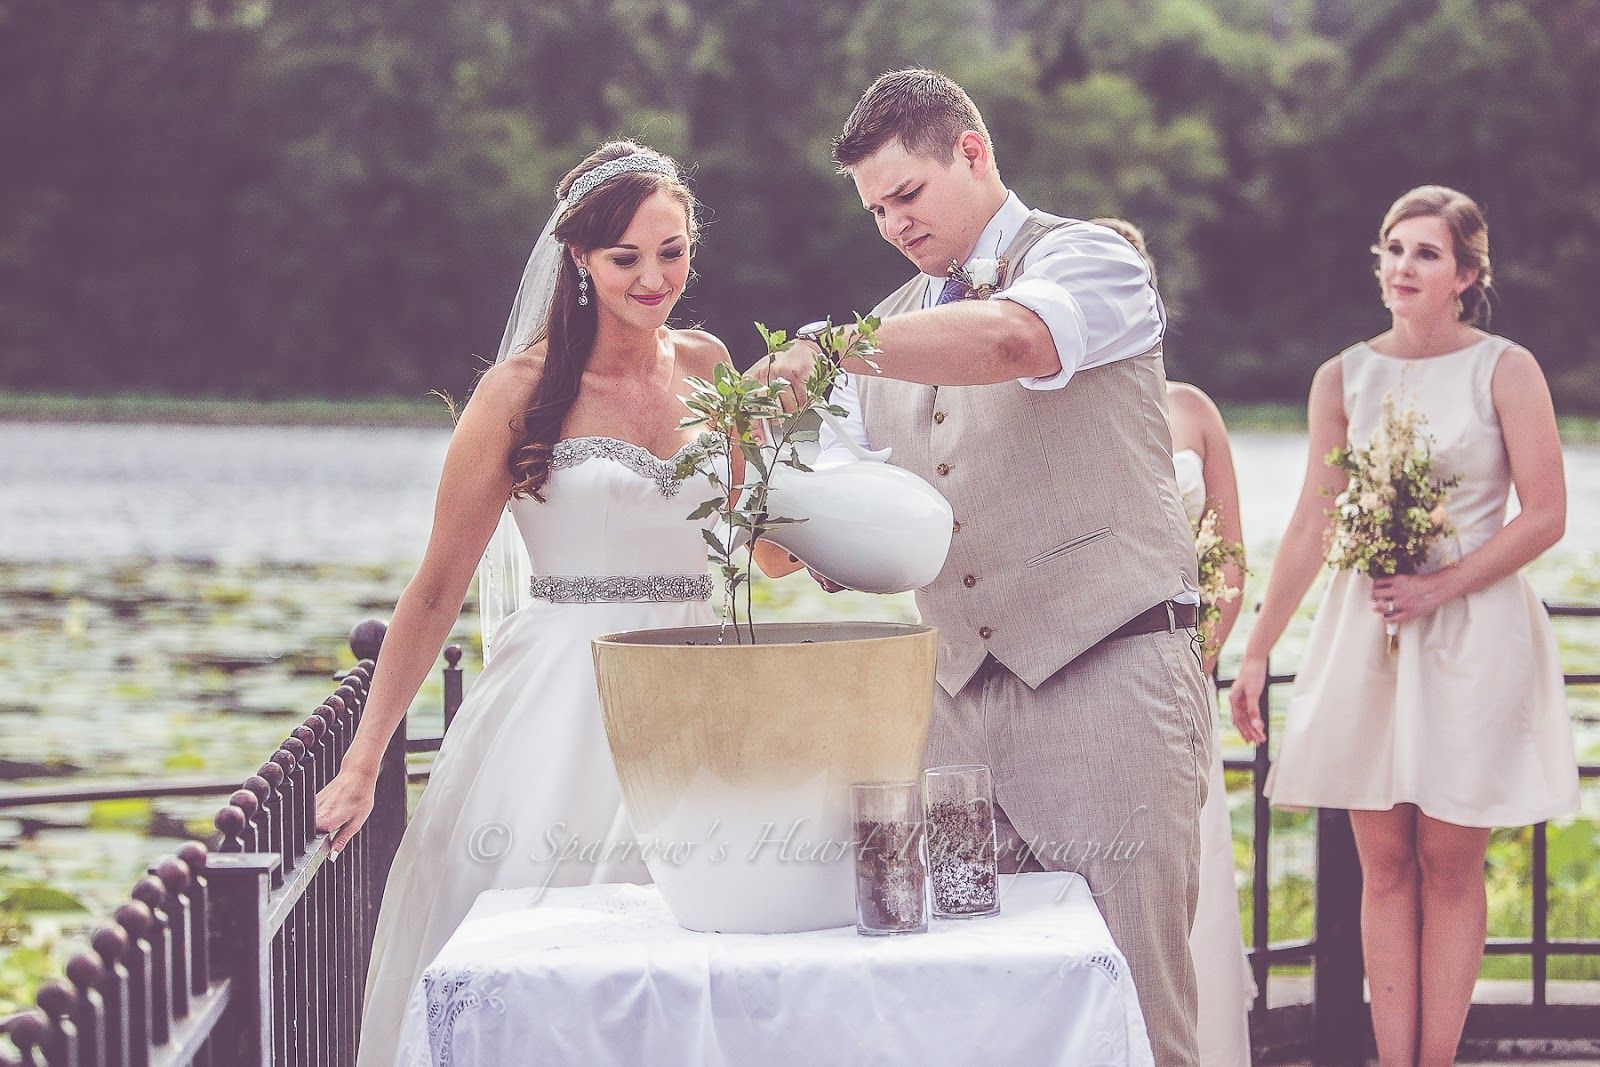 Sparrow S Heart Photography Huntsville State Park Wedding Huntsville Texas Casey And Dylan Park Weddings Wedding Huntsville